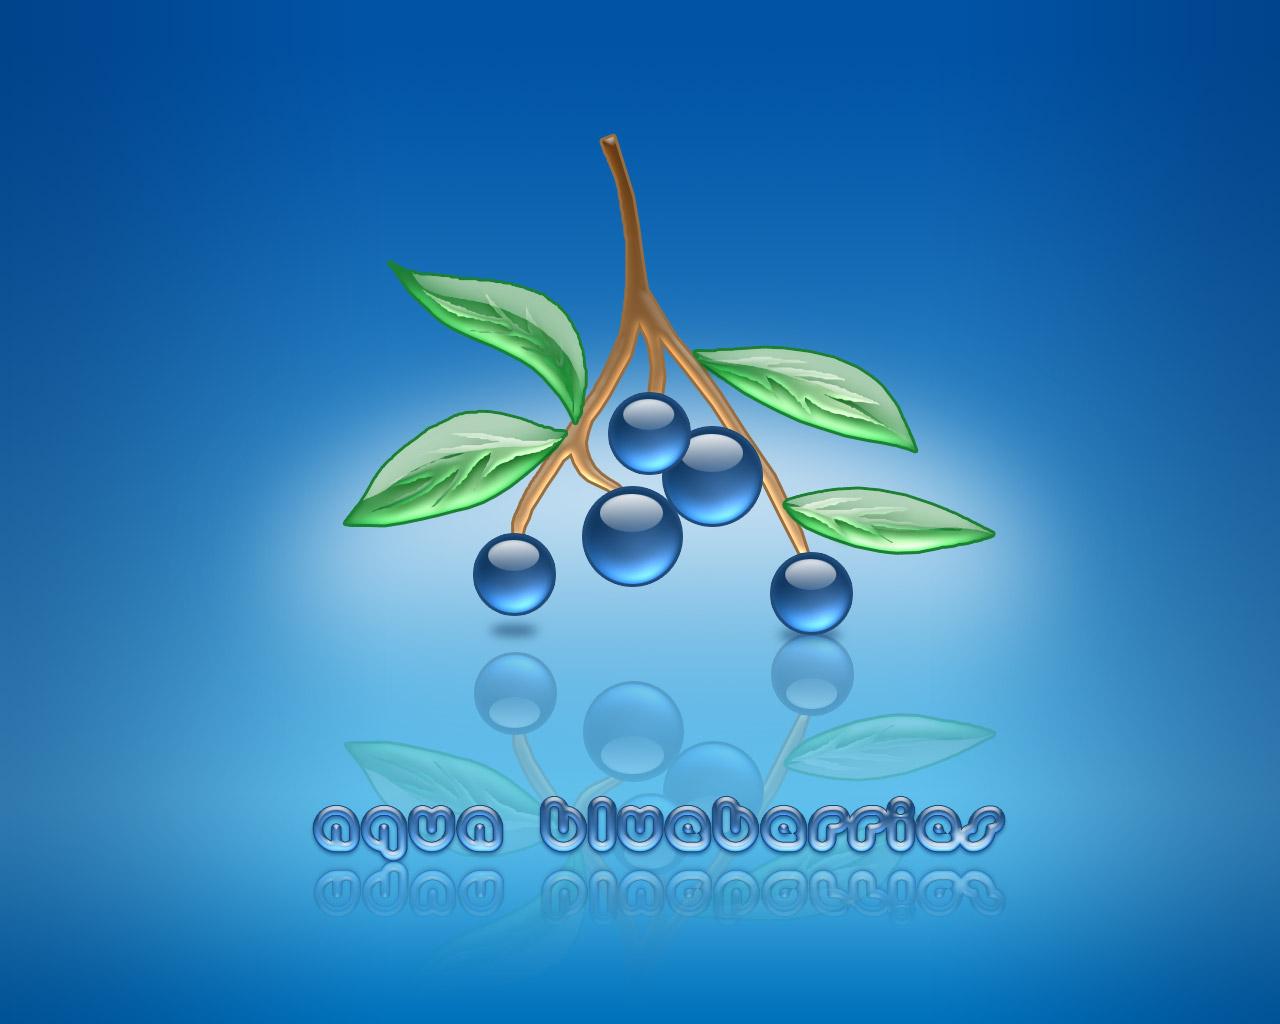 http://1.bp.blogspot.com/-_M1nggTFV98/Tisf9wTXZ0I/AAAAAAAAH-c/is-D2chnuqk/s1600/CBAW.co.cc+Aqua+Blueberries.jpg